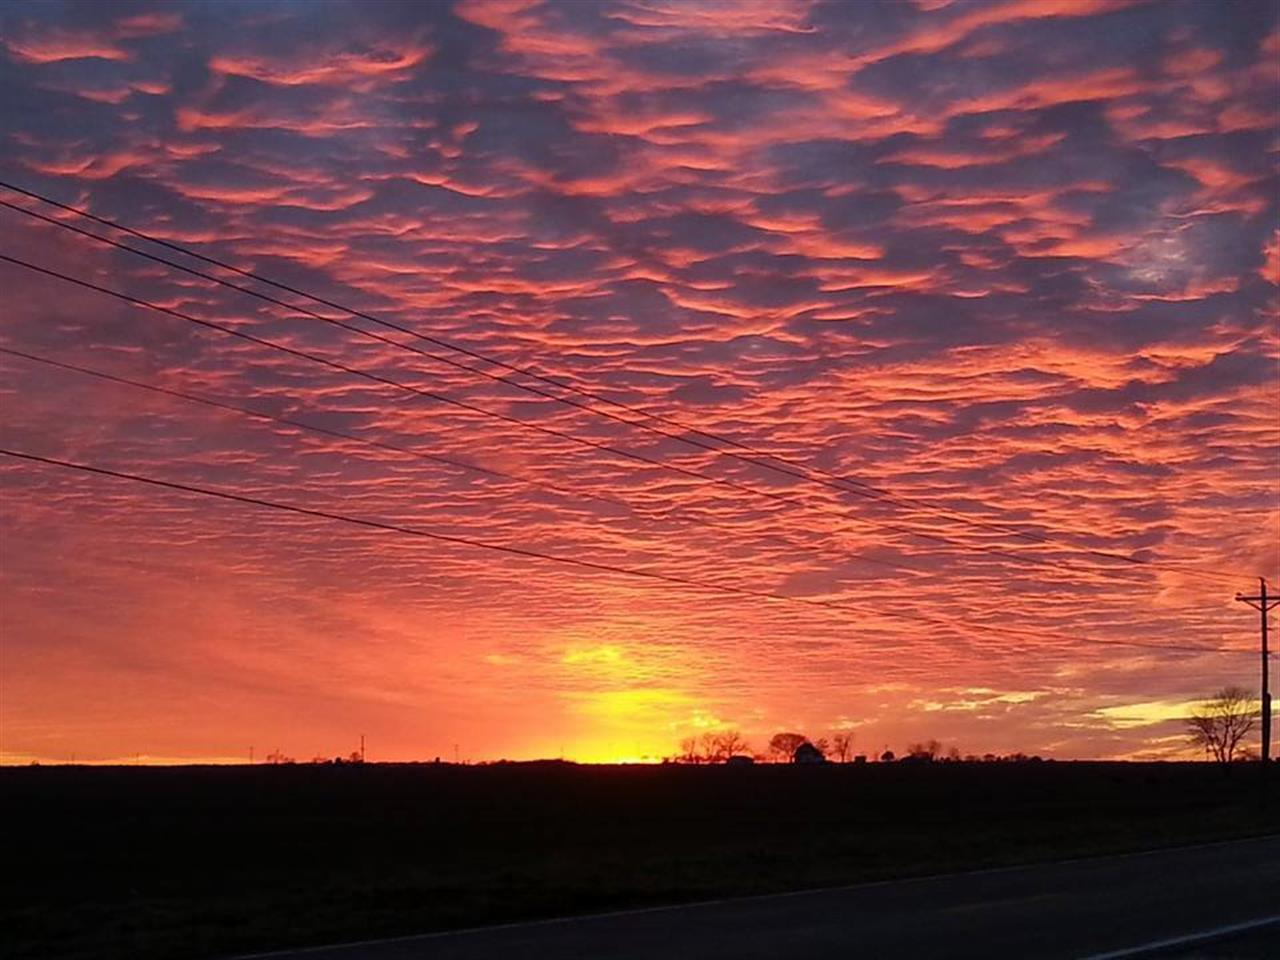 Sky over Metro East Illinois